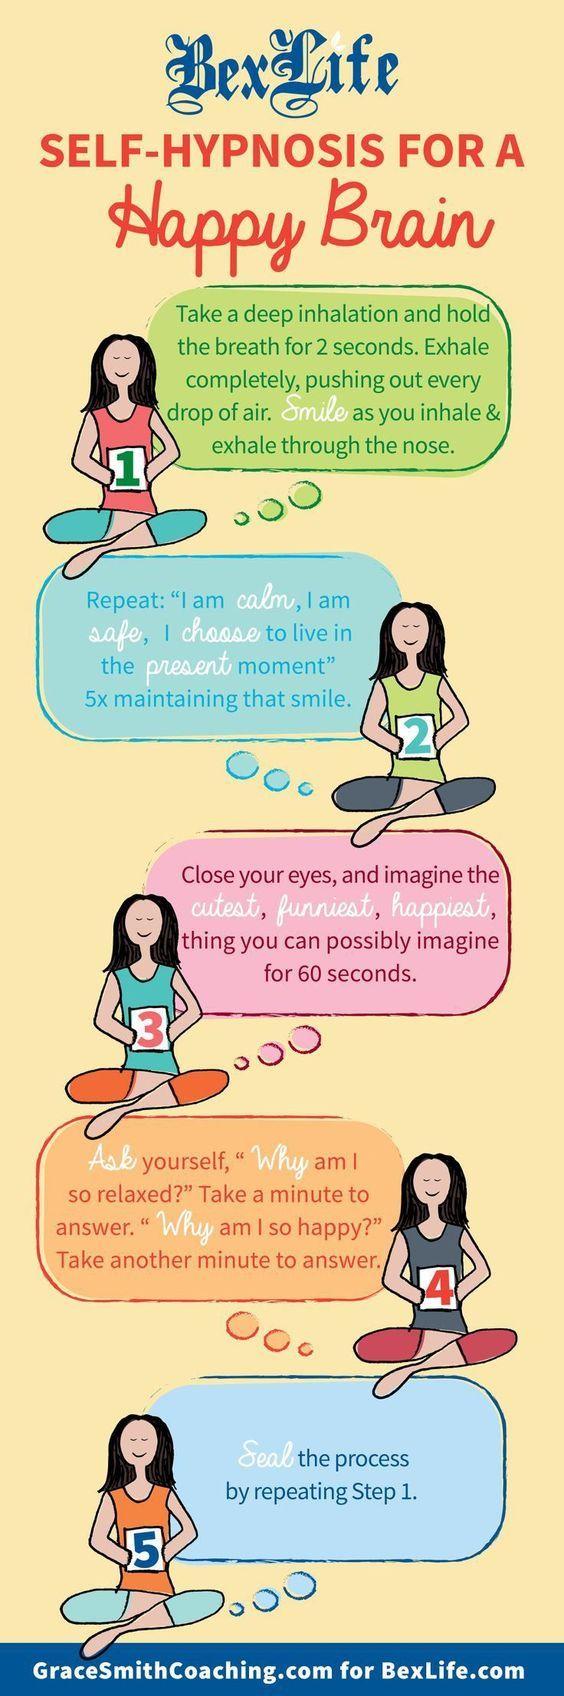 Self Hypnosis for a Happy Brain #NLP - Neuro Linguistic Programming - Maroc Désert Expérience http://www.marocdesertexperience.com